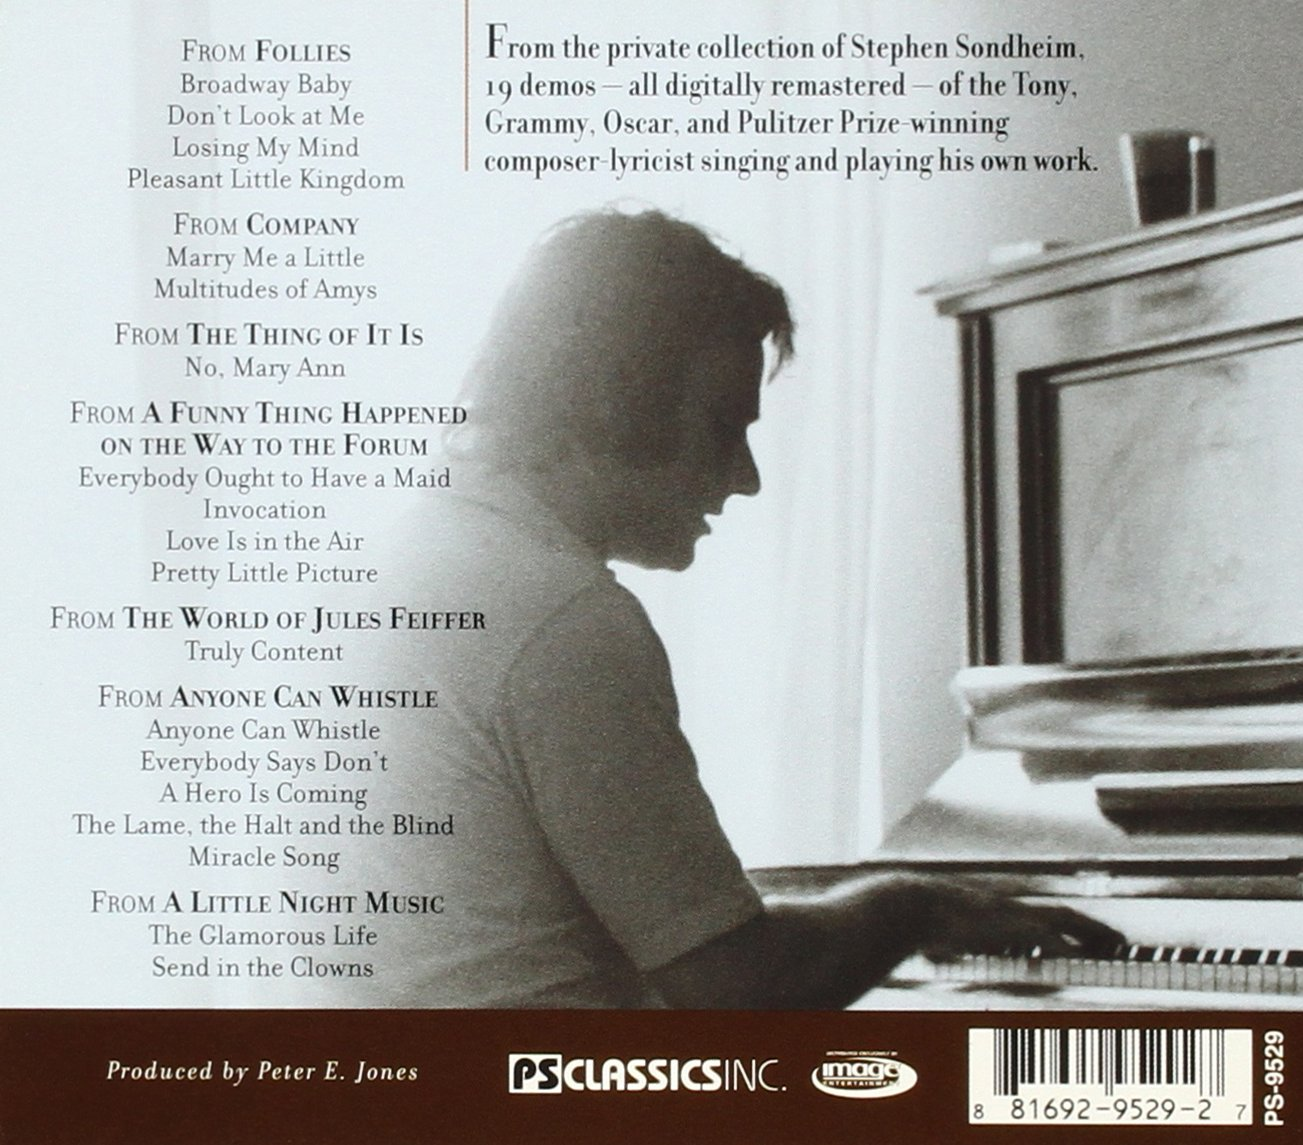 Stephen sondheim sondheim sings vol 1 1962 1972 amazon stephen sondheim sondheim sings vol 1 1962 1972 amazon music hexwebz Choice Image